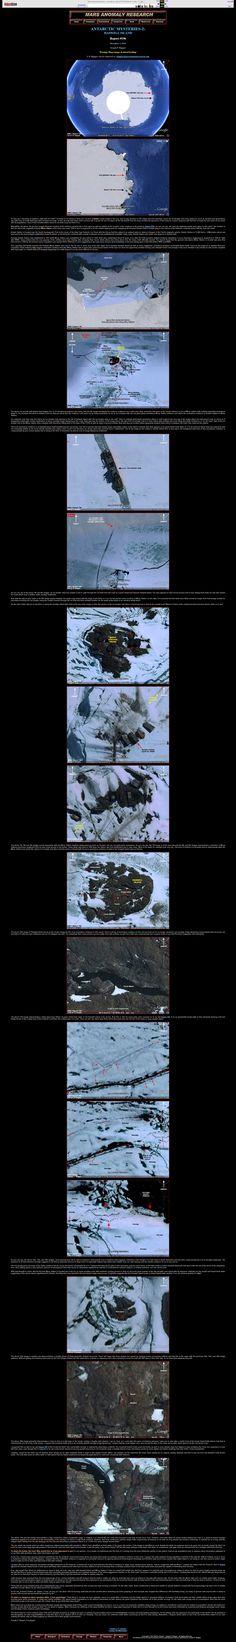 Antarctic Mysteries 2